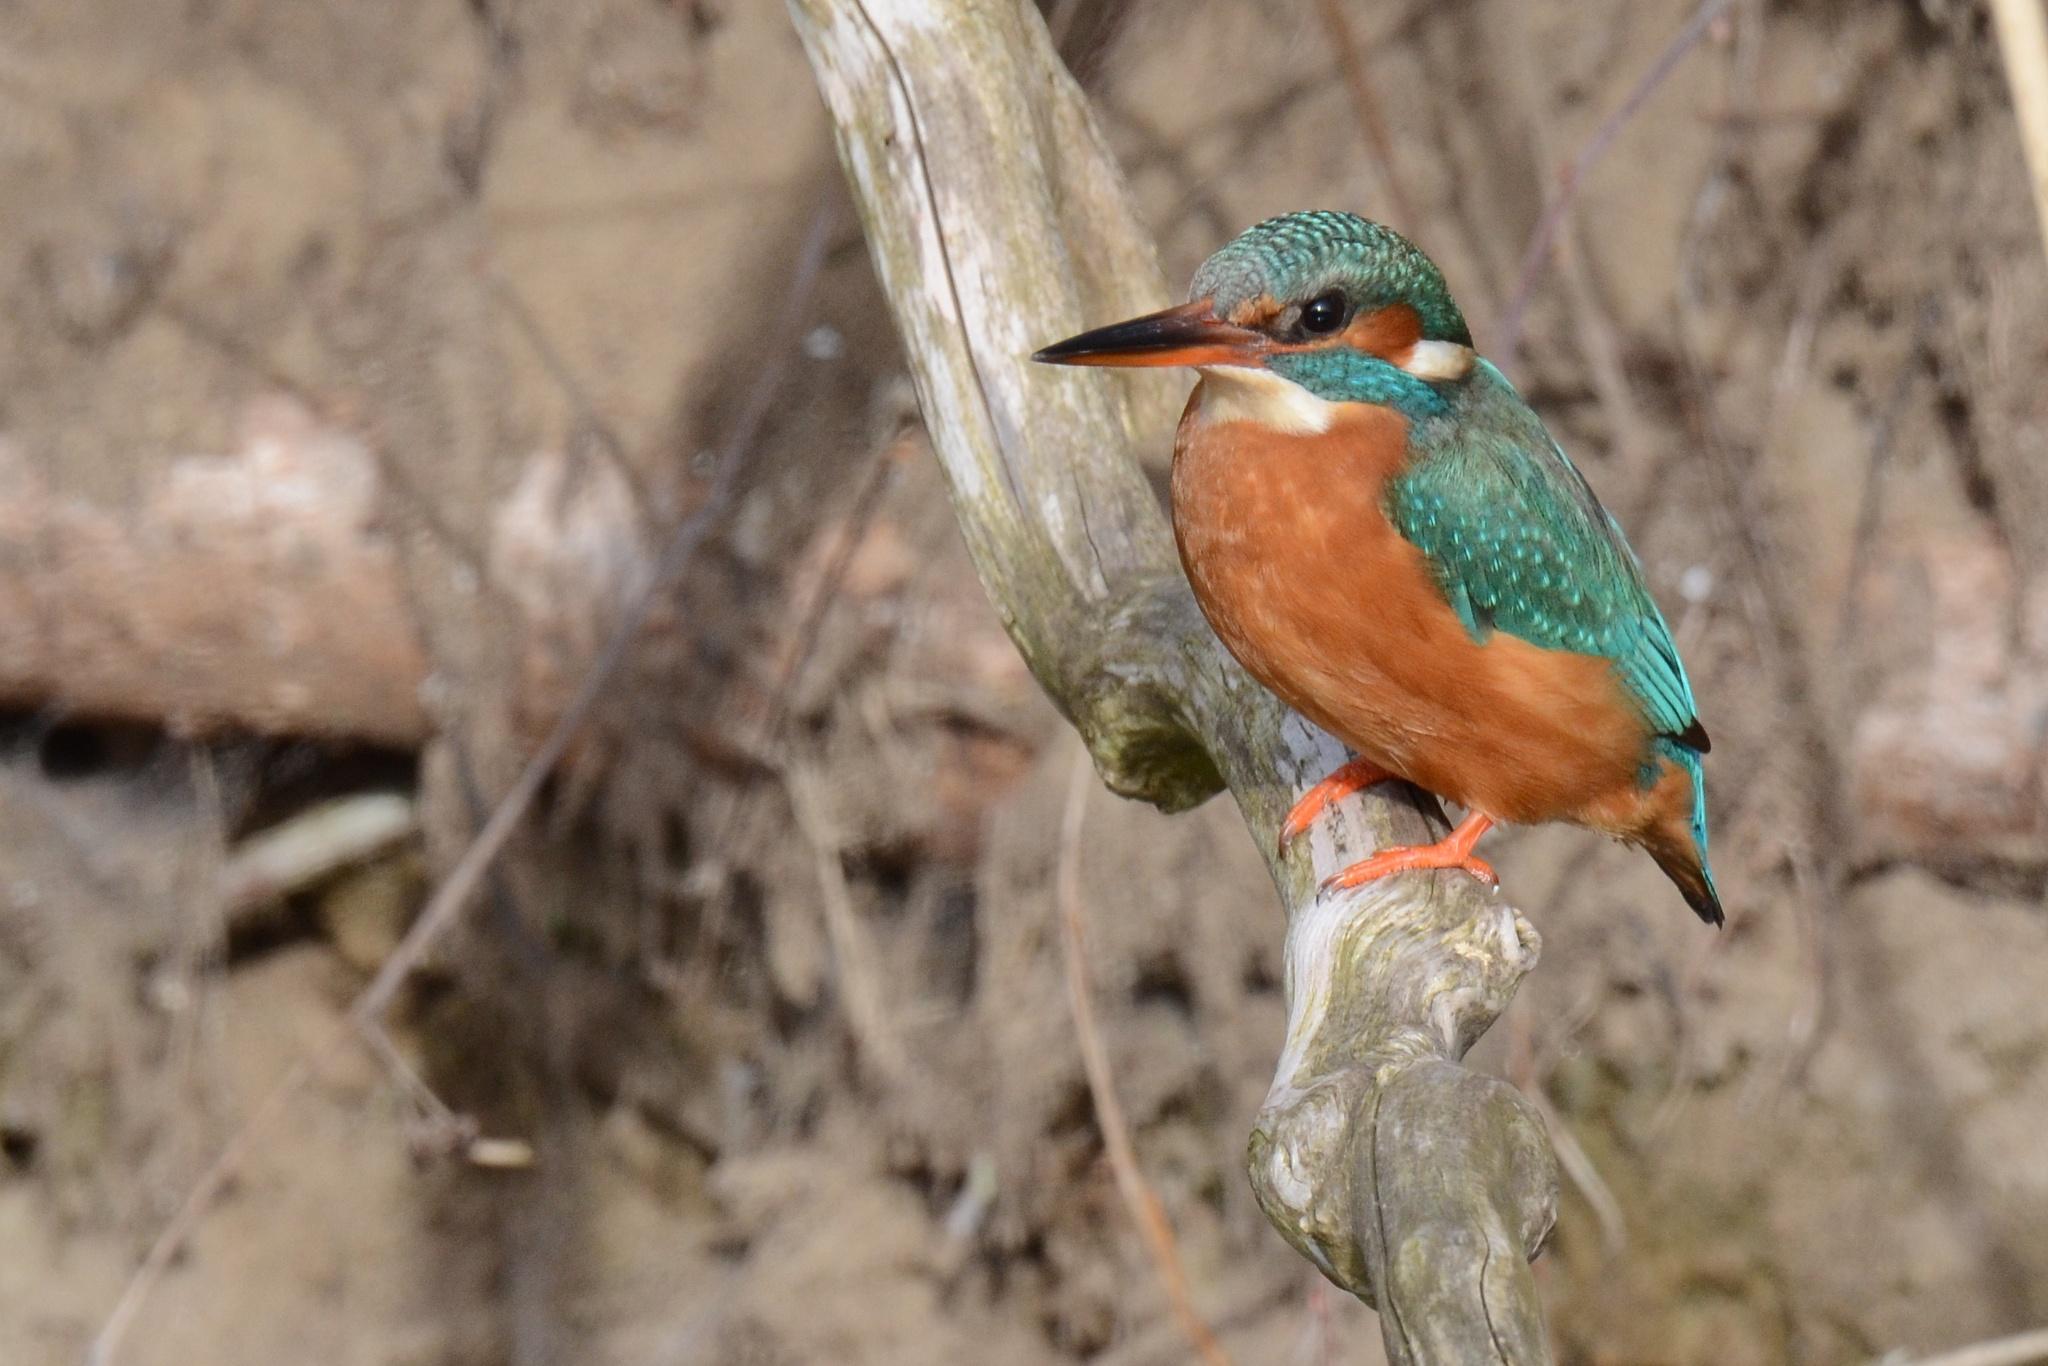 Kingfisher by klaaspelgrim